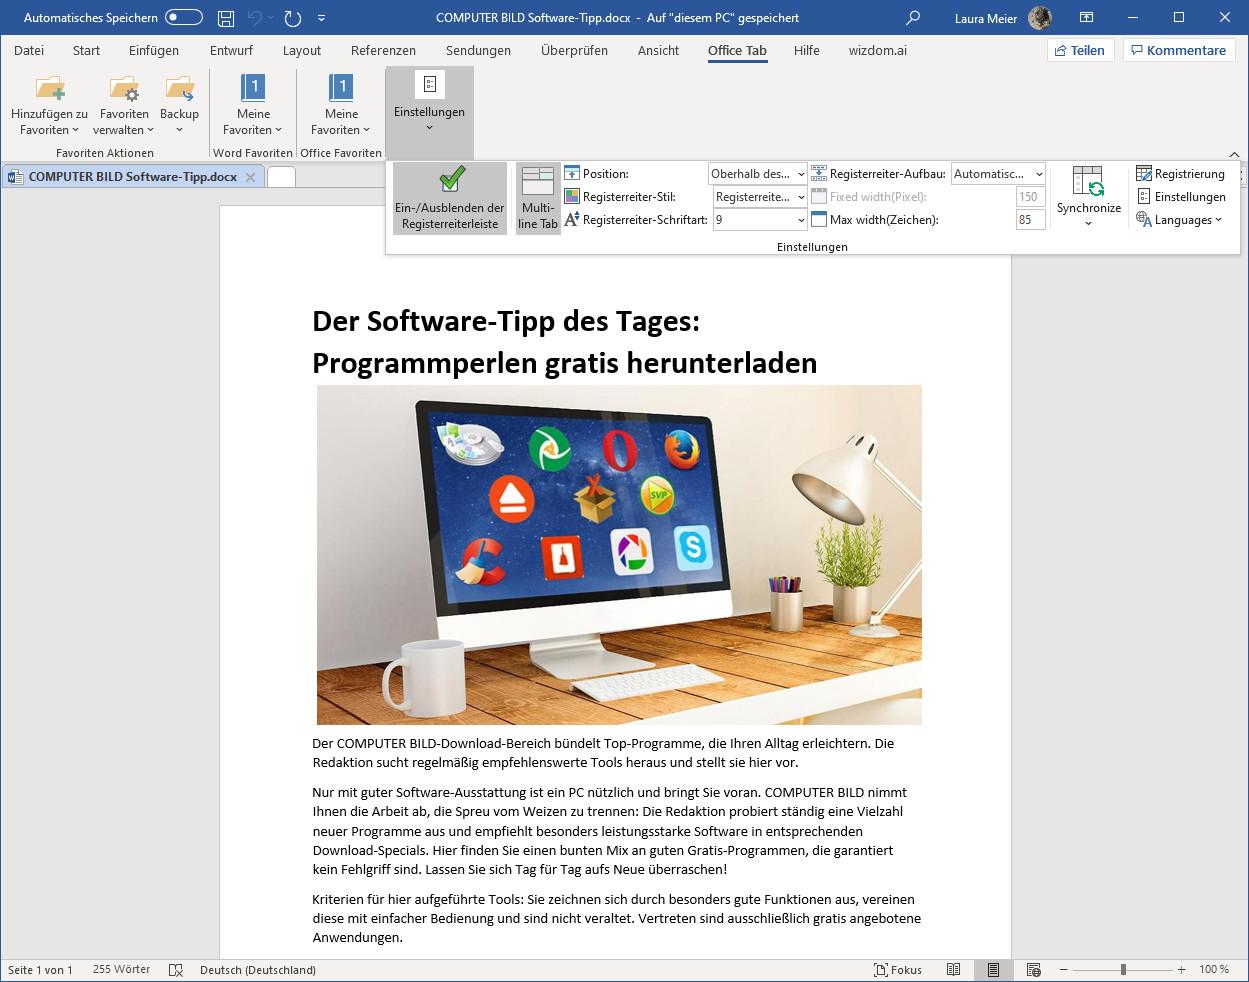 Screenshot 1 - Office Tab